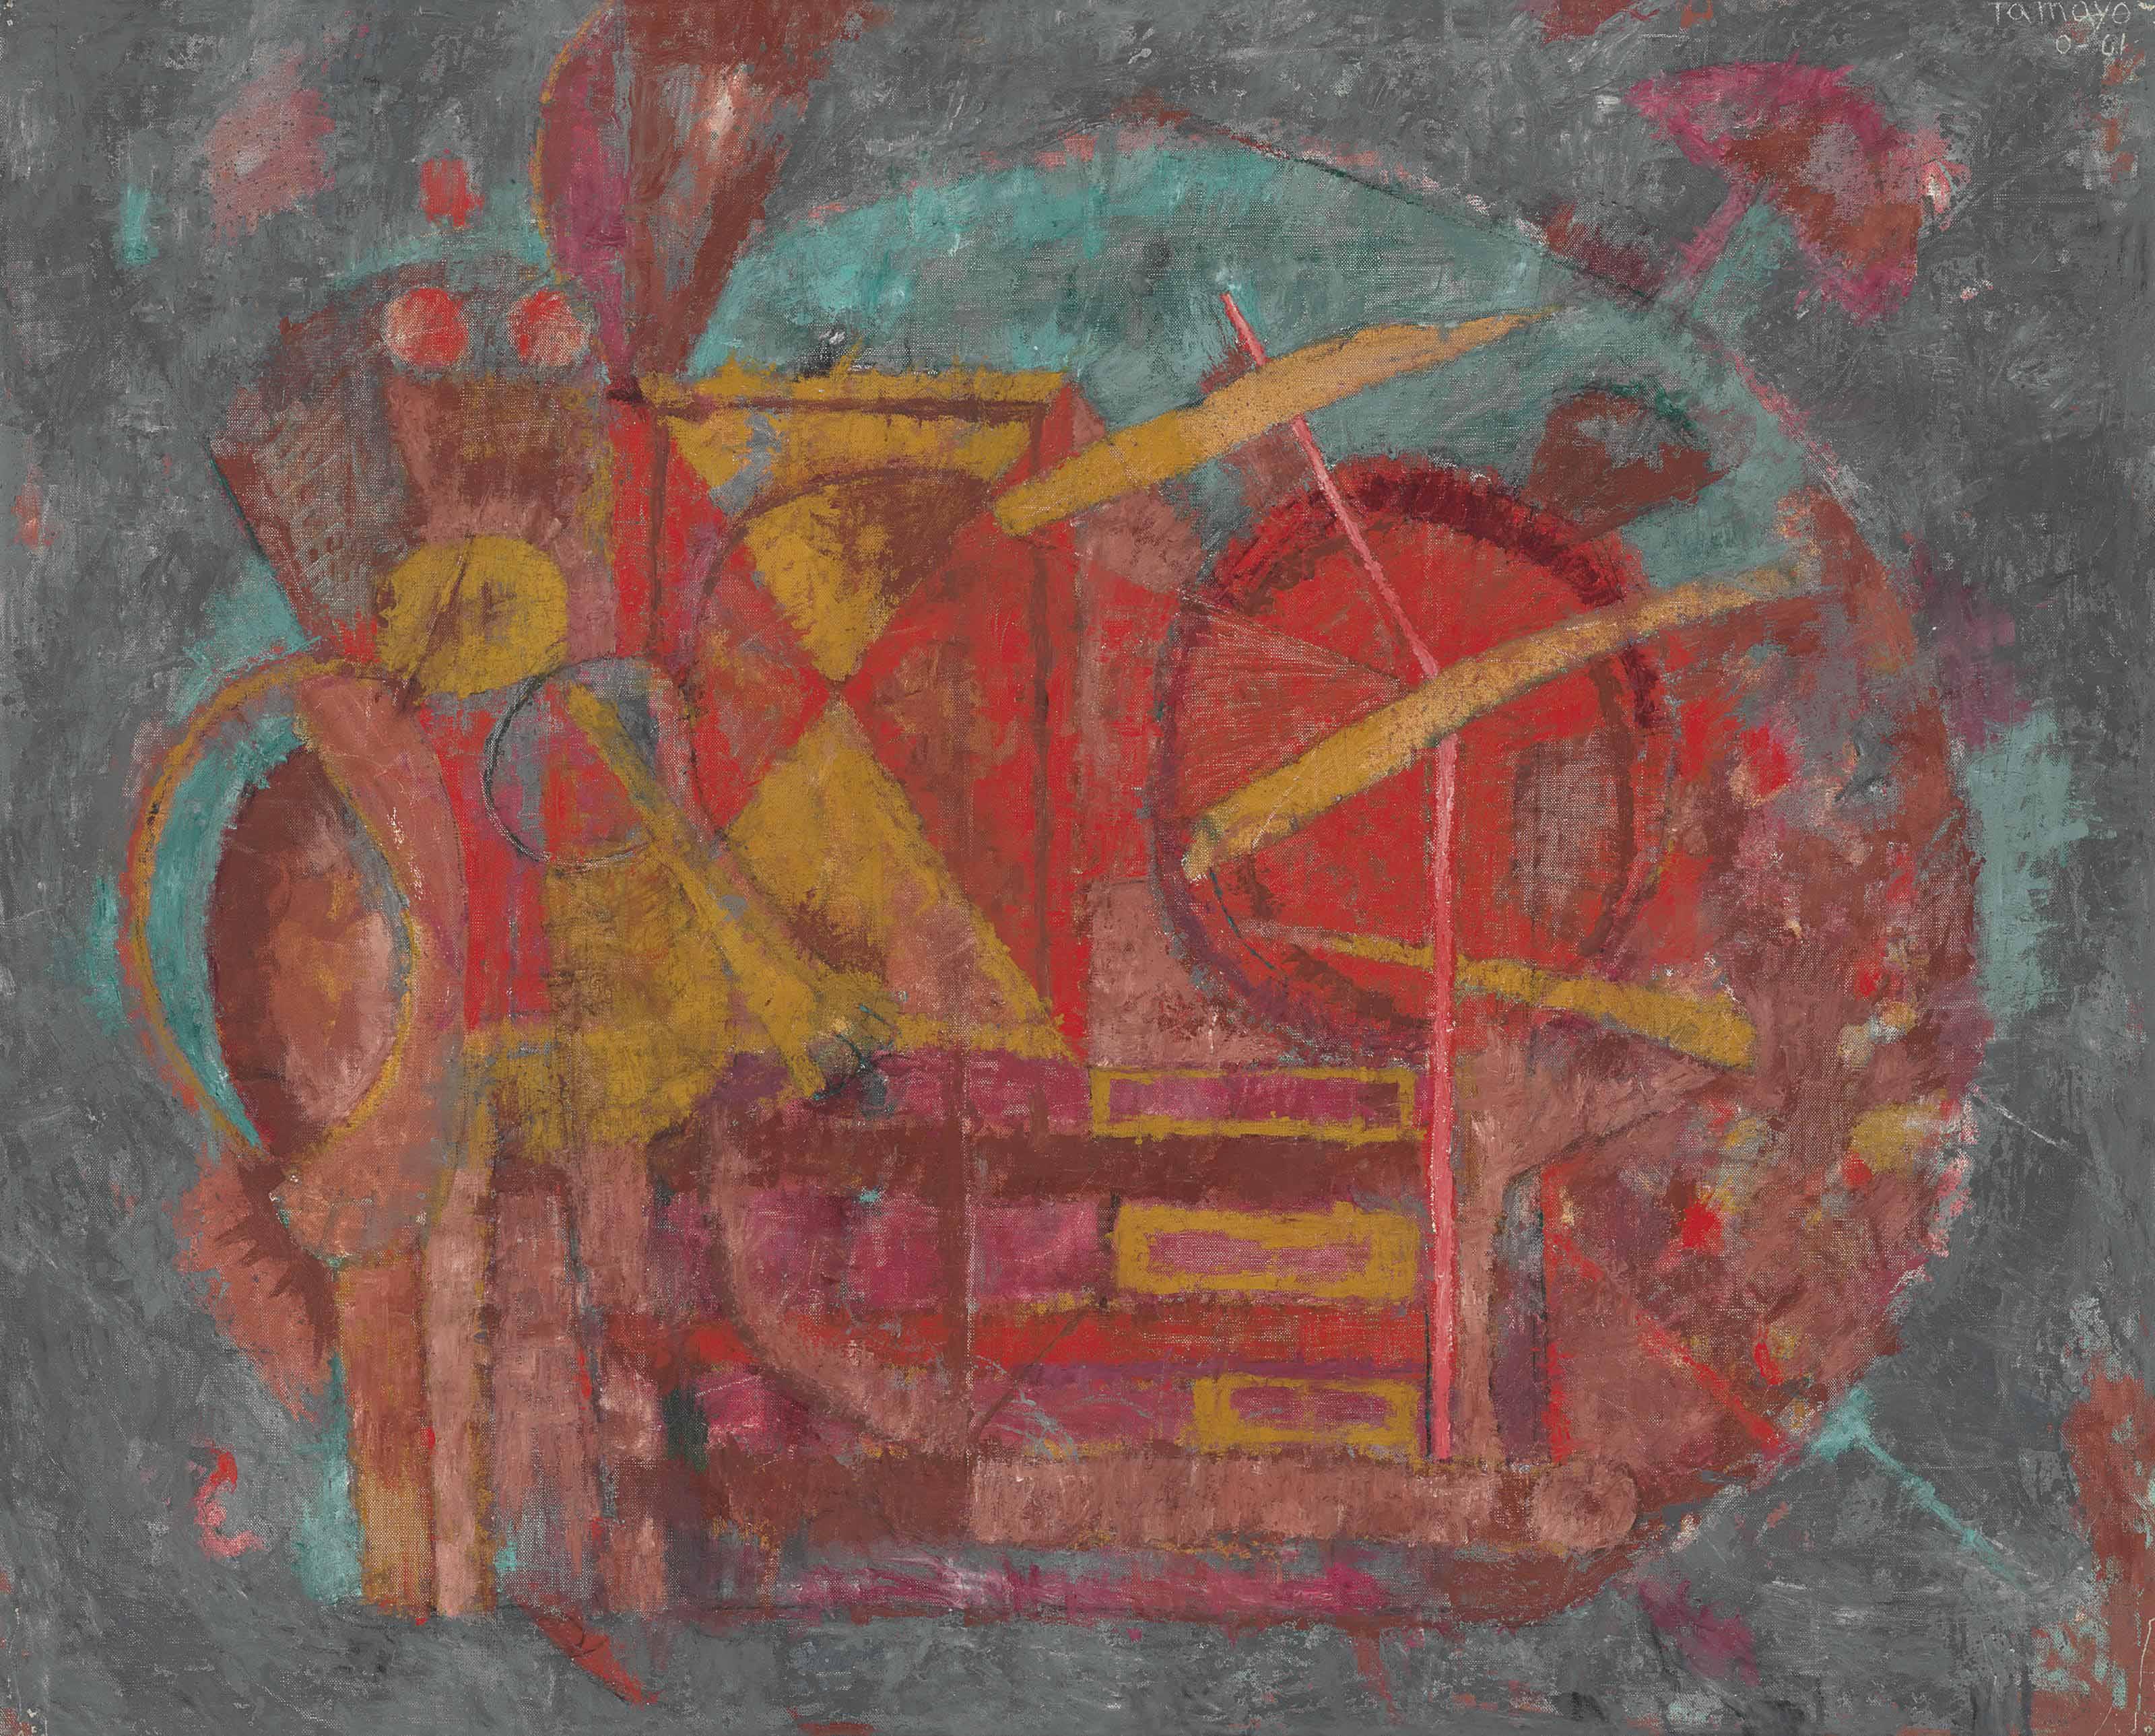 Rufino Tamayo (1899-1991)